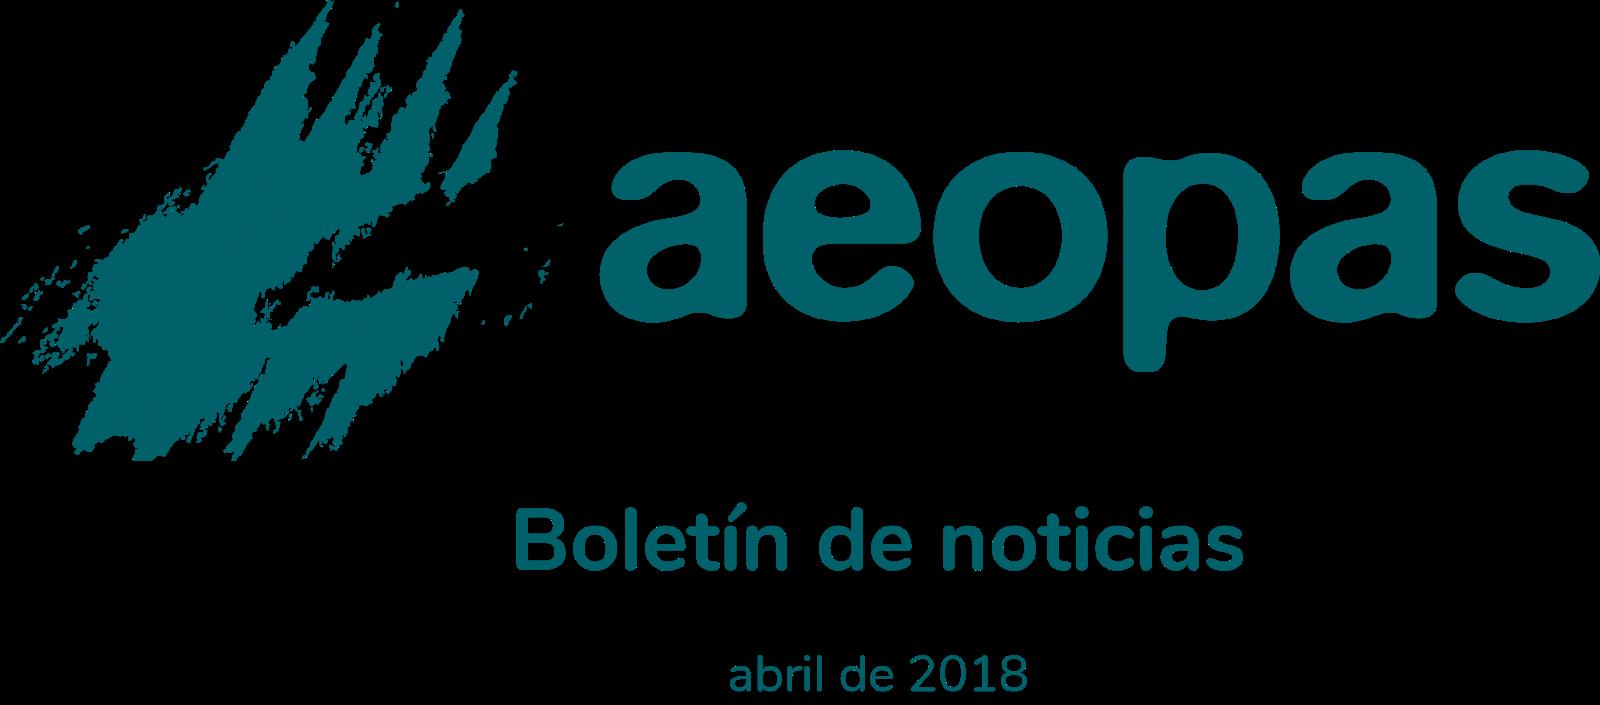 ASOCIACIÓN ESPAÑOLA DE OPERADORES PÚBLICOS DEL AGUA